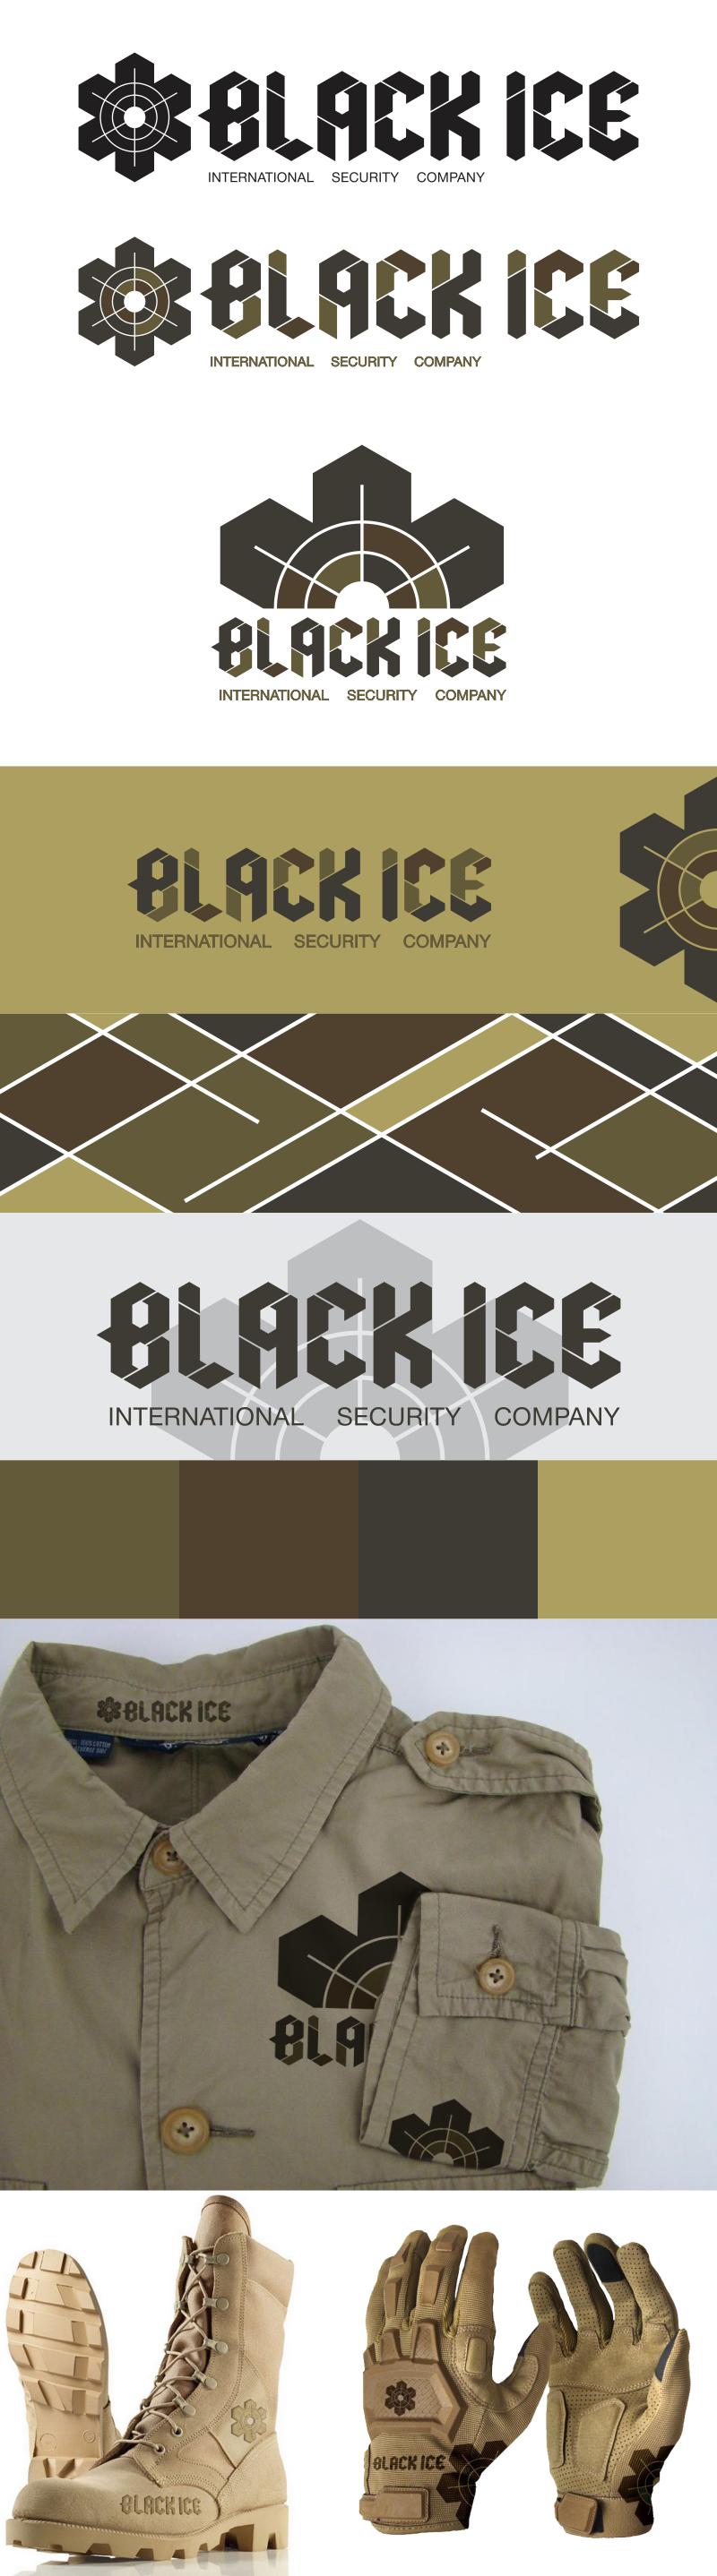 "Логотип + Фирменный стиль для компании ""BLACK ICE"" фото f_54157189e26dbaf4.png"